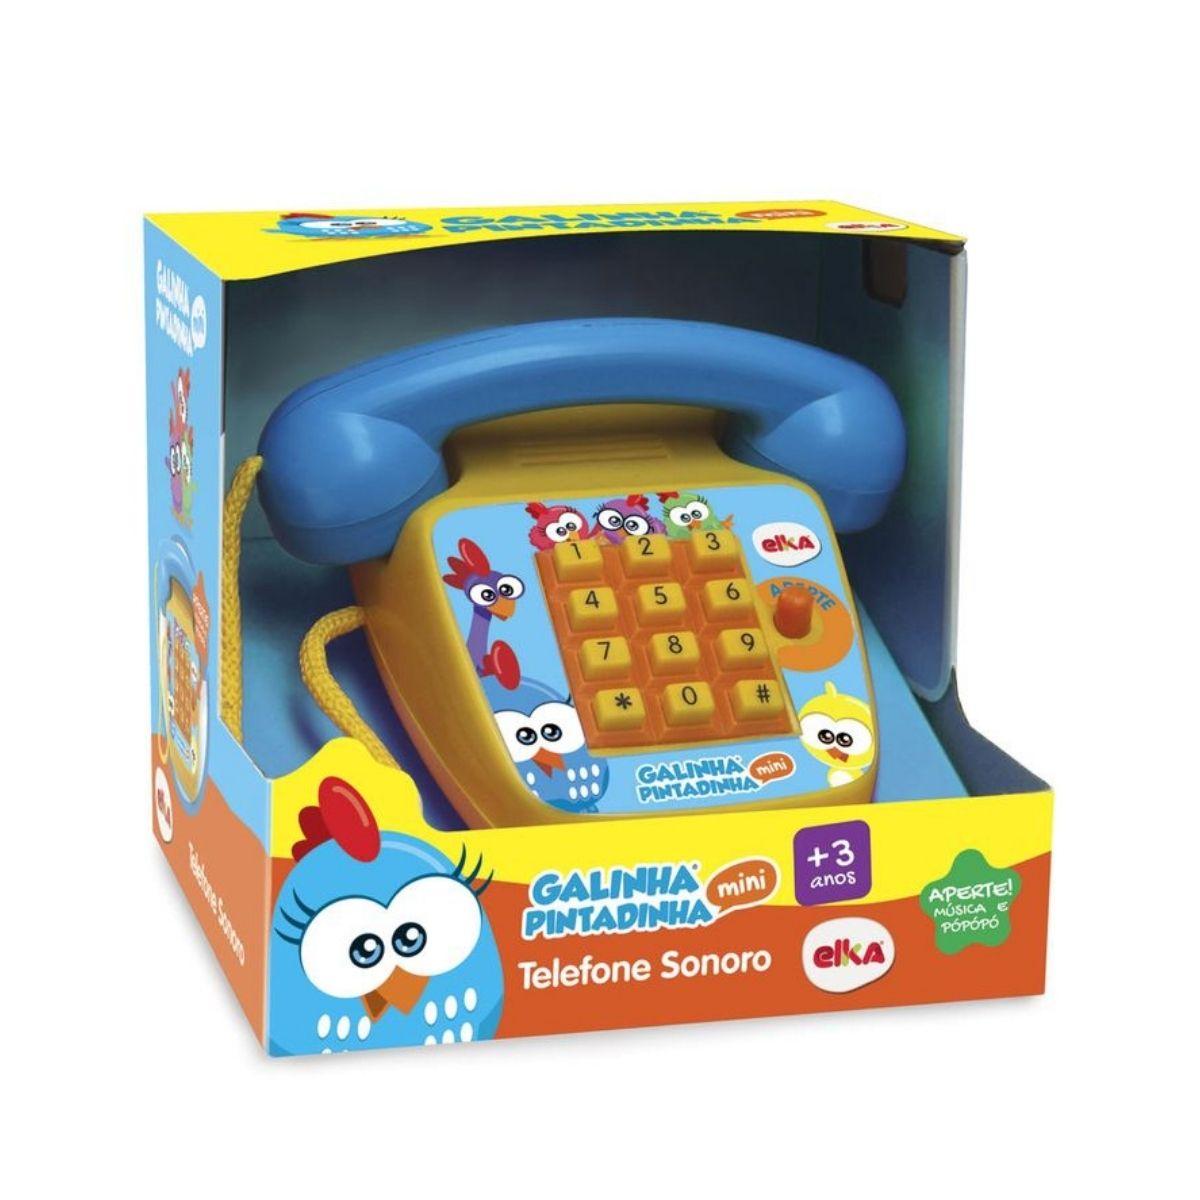 Telefone Sonoro Galinha Pintadinha Versão Mini Elka